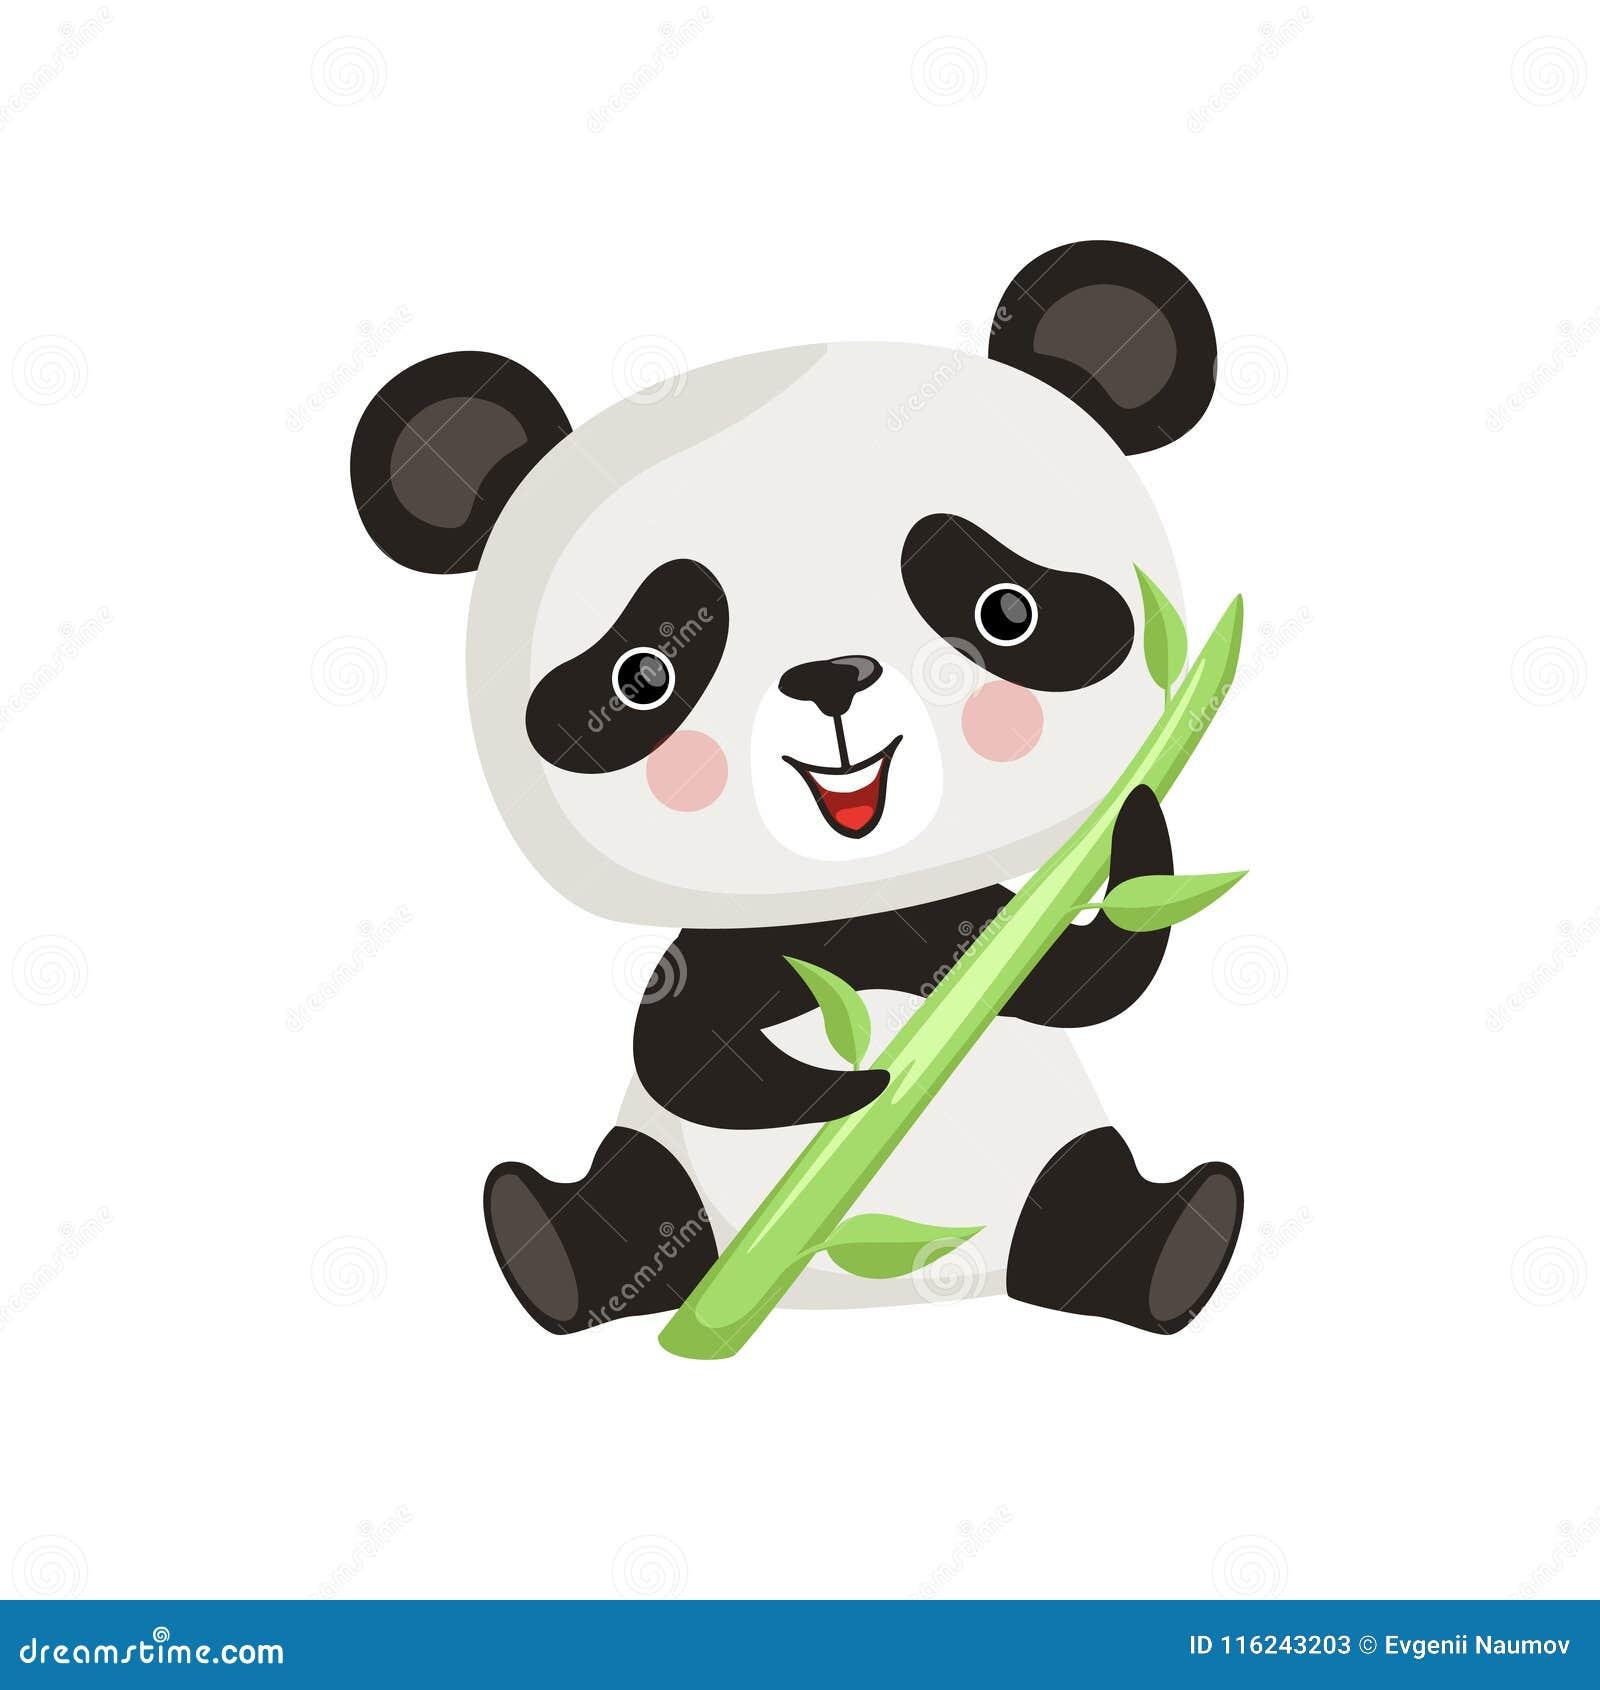 Cartoon Golf Panda on cartoon food, cartoon raccoon, cartoon bunny, cartoon tiger, cartoon leopard, cartoon mouse, cartoon bamboo, cartoon penguin, cartoon kitten, cartoon kitty, cartoon animals, cartoon shark, cartoon monkey, cartoon goat, cartoon squirrel, cartoon puppy, cartoon bird, cartoon koala, cartoon cat, cartoon rat,